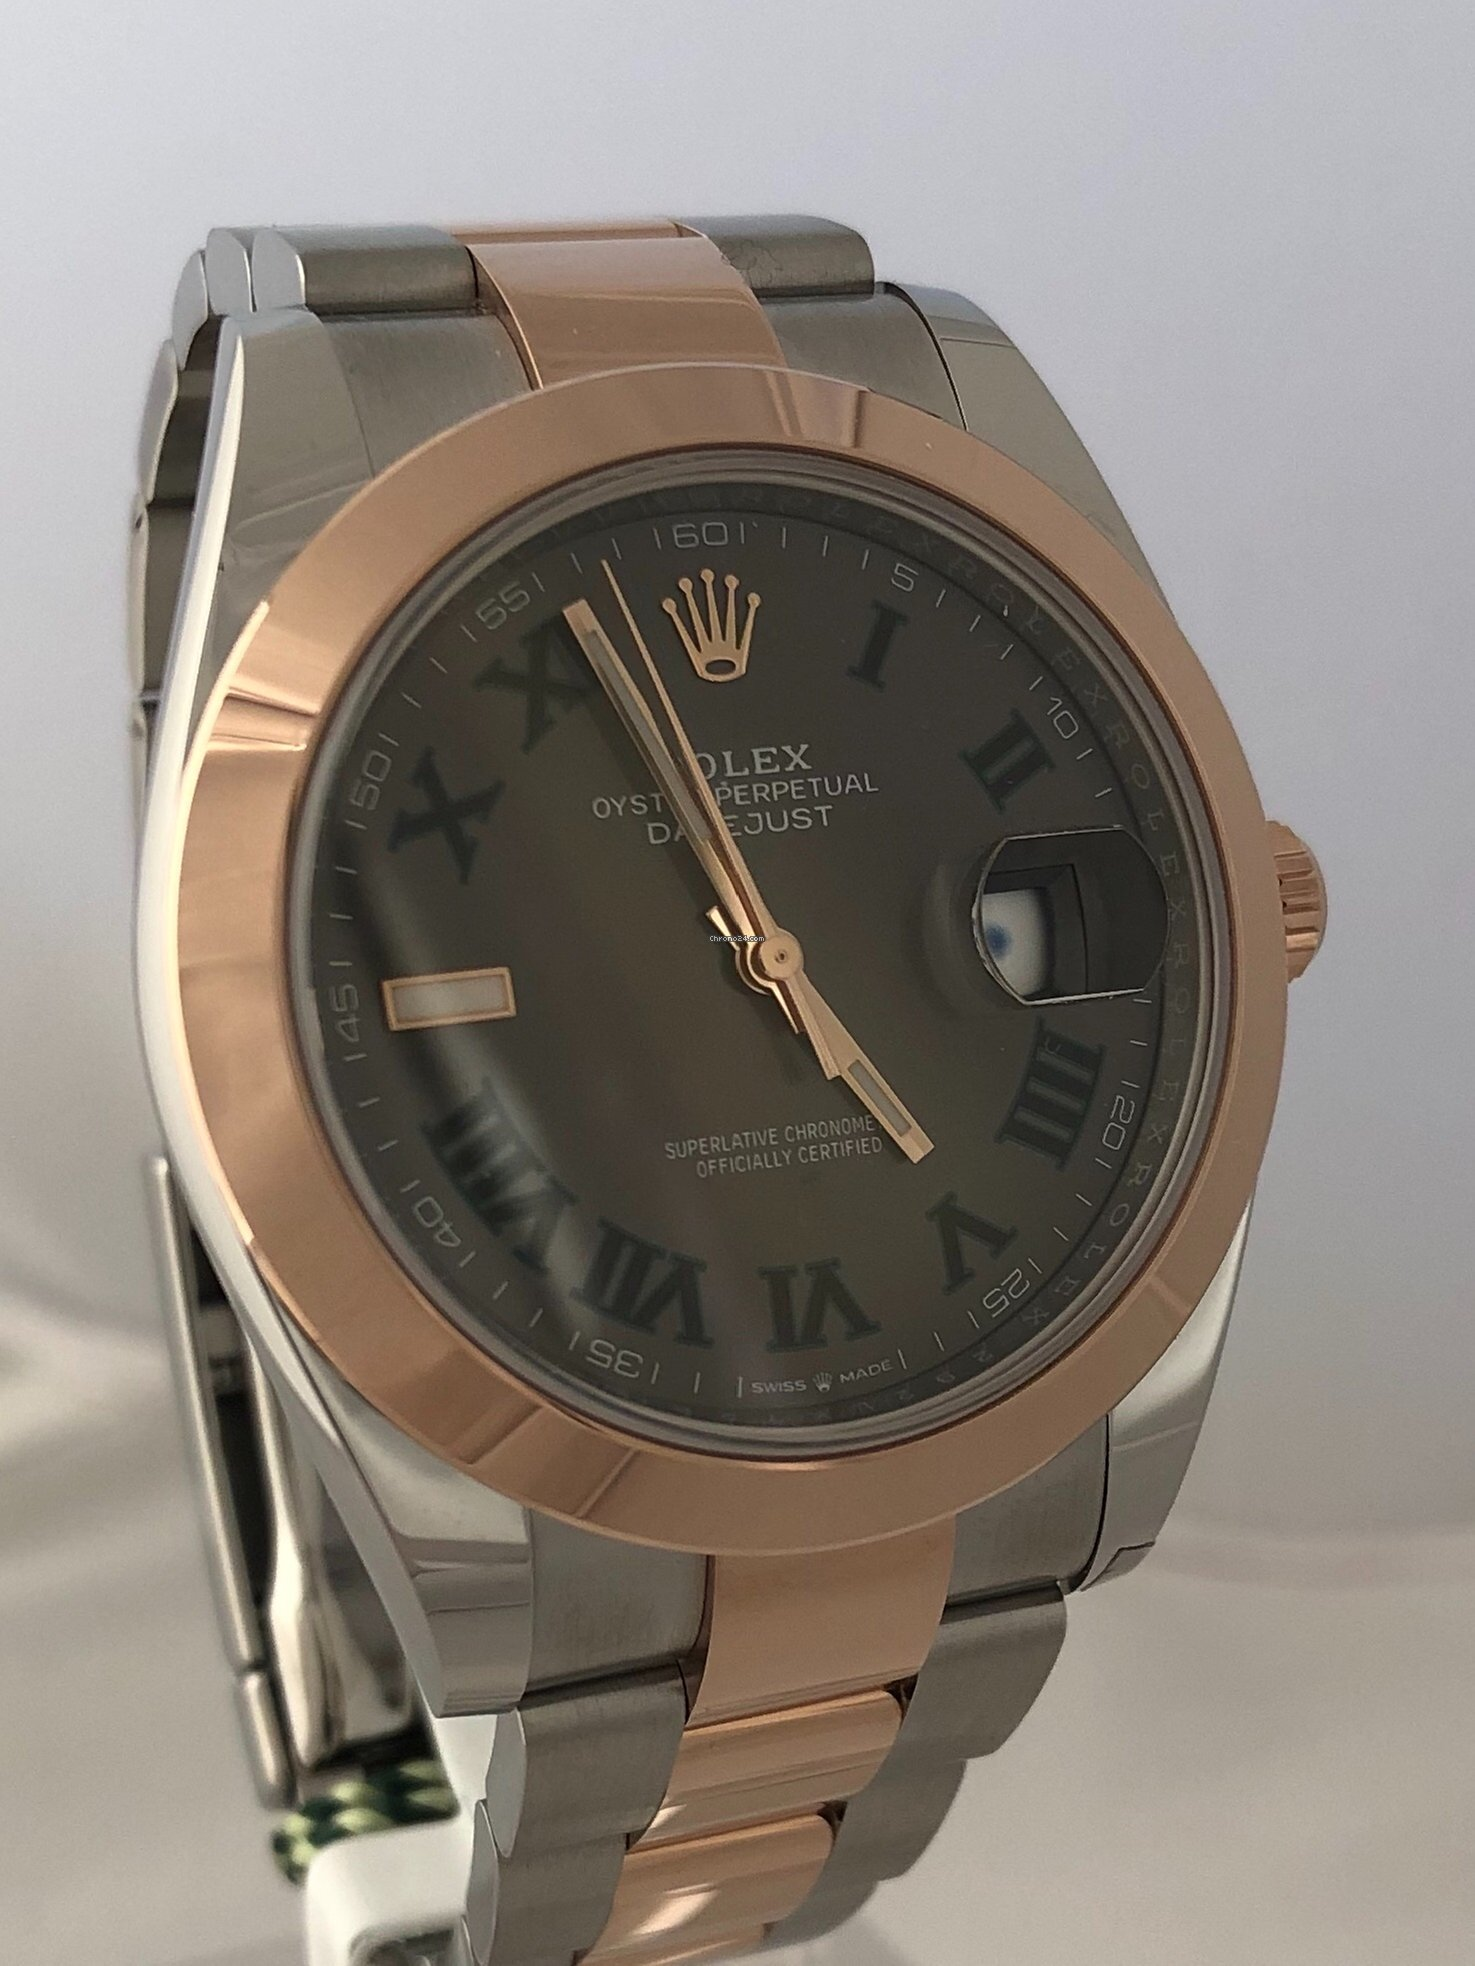 Rolex | karoraadasvetel.hu luxus karóra adás vétel